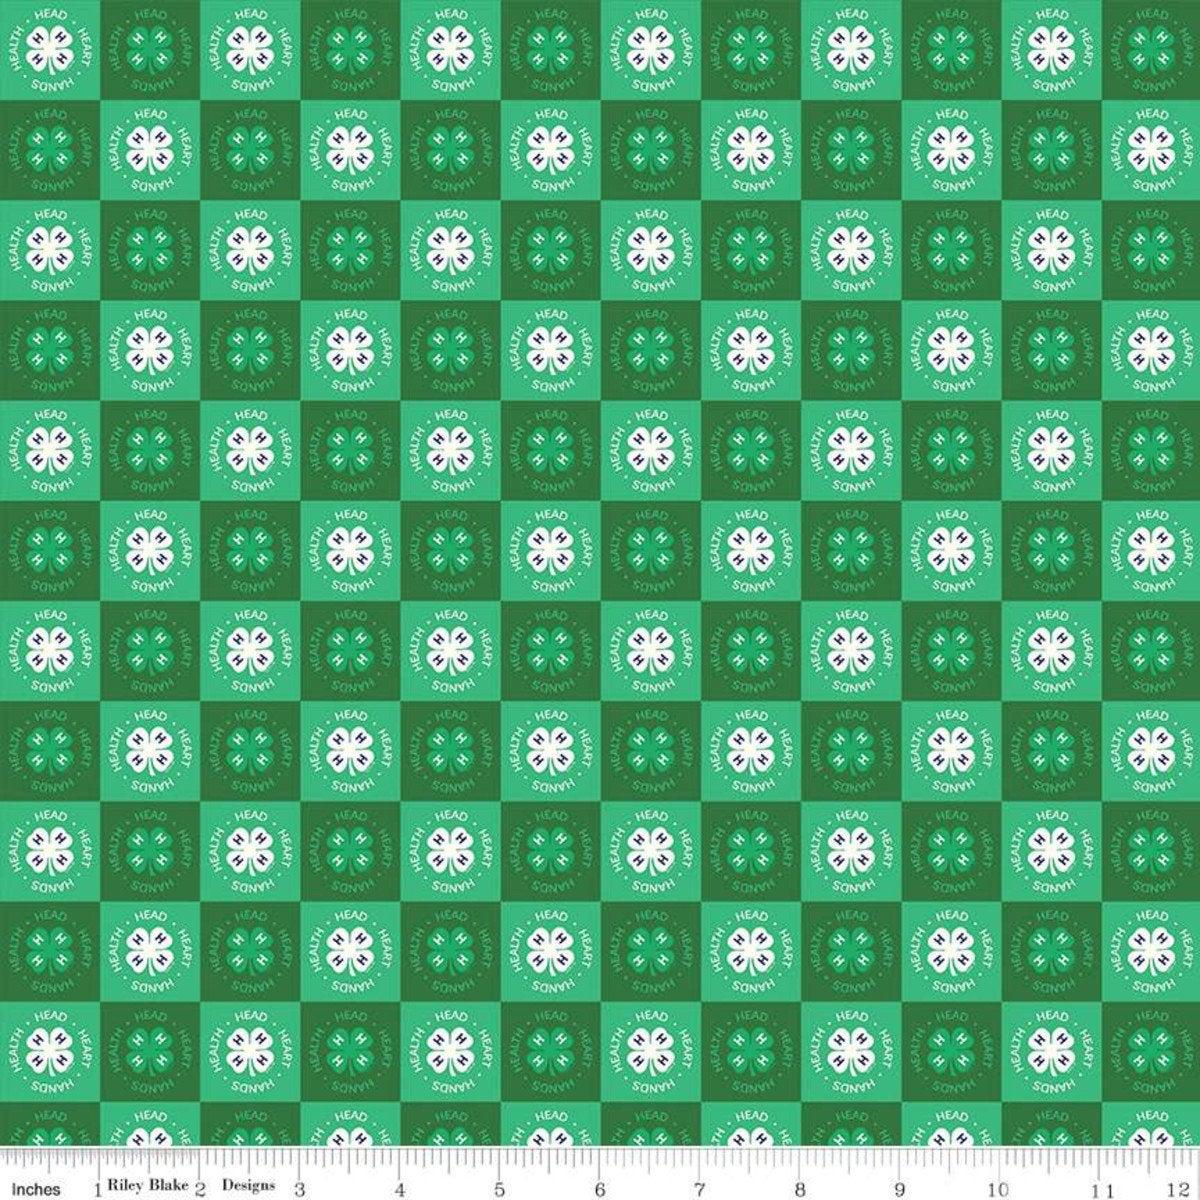 4-H Clover Blocks Fabric By Riley Blake C9123-GREEN